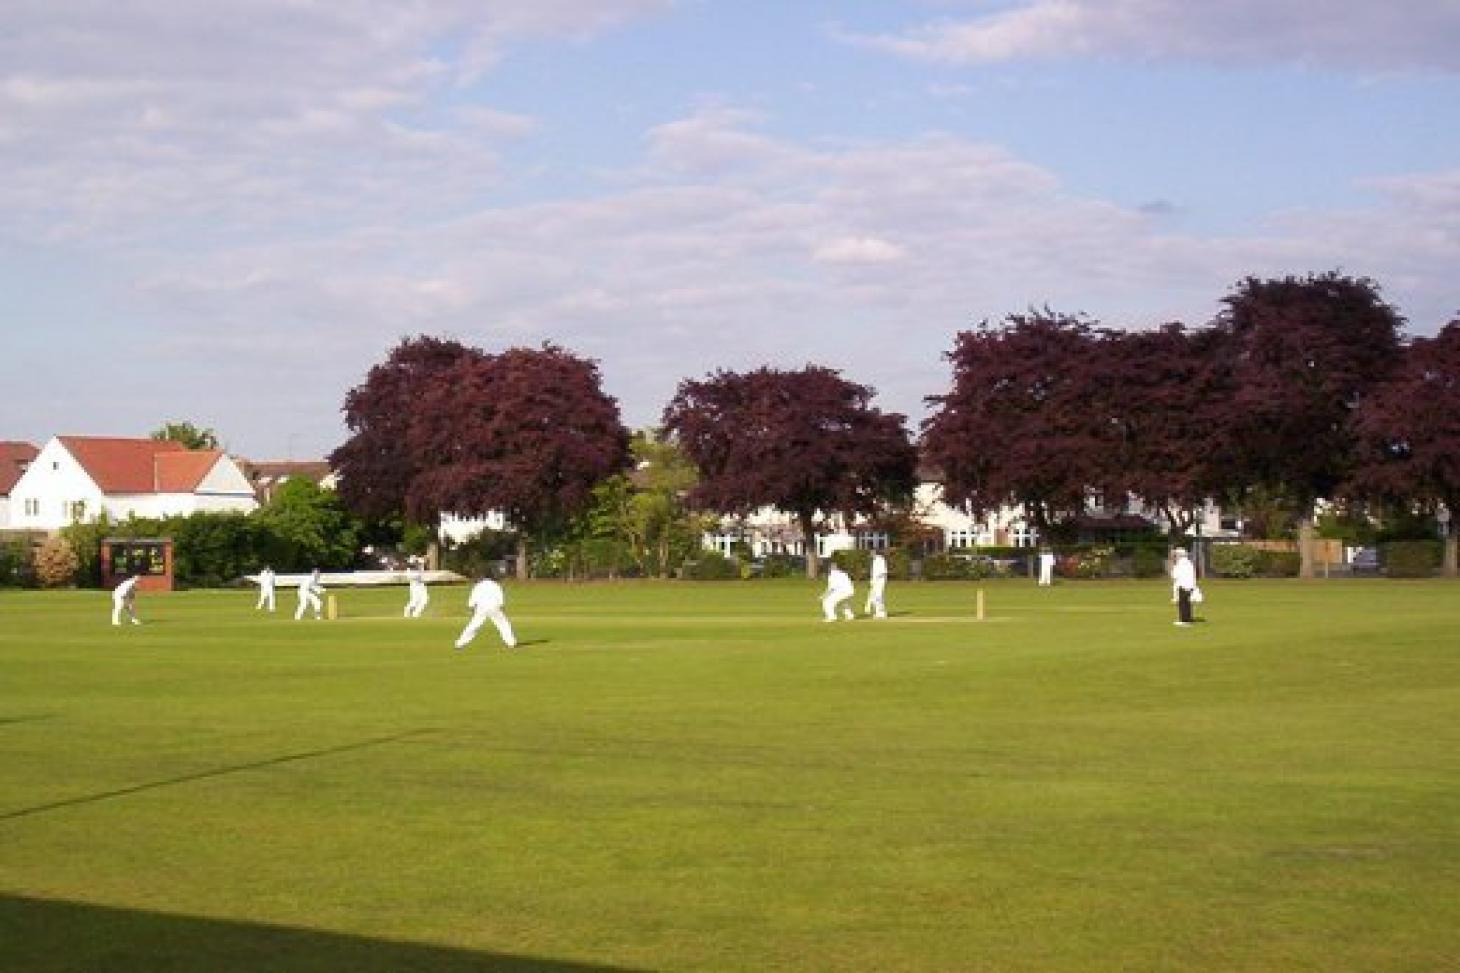 Barnes Sports Club Full size | Grass cricket facilities